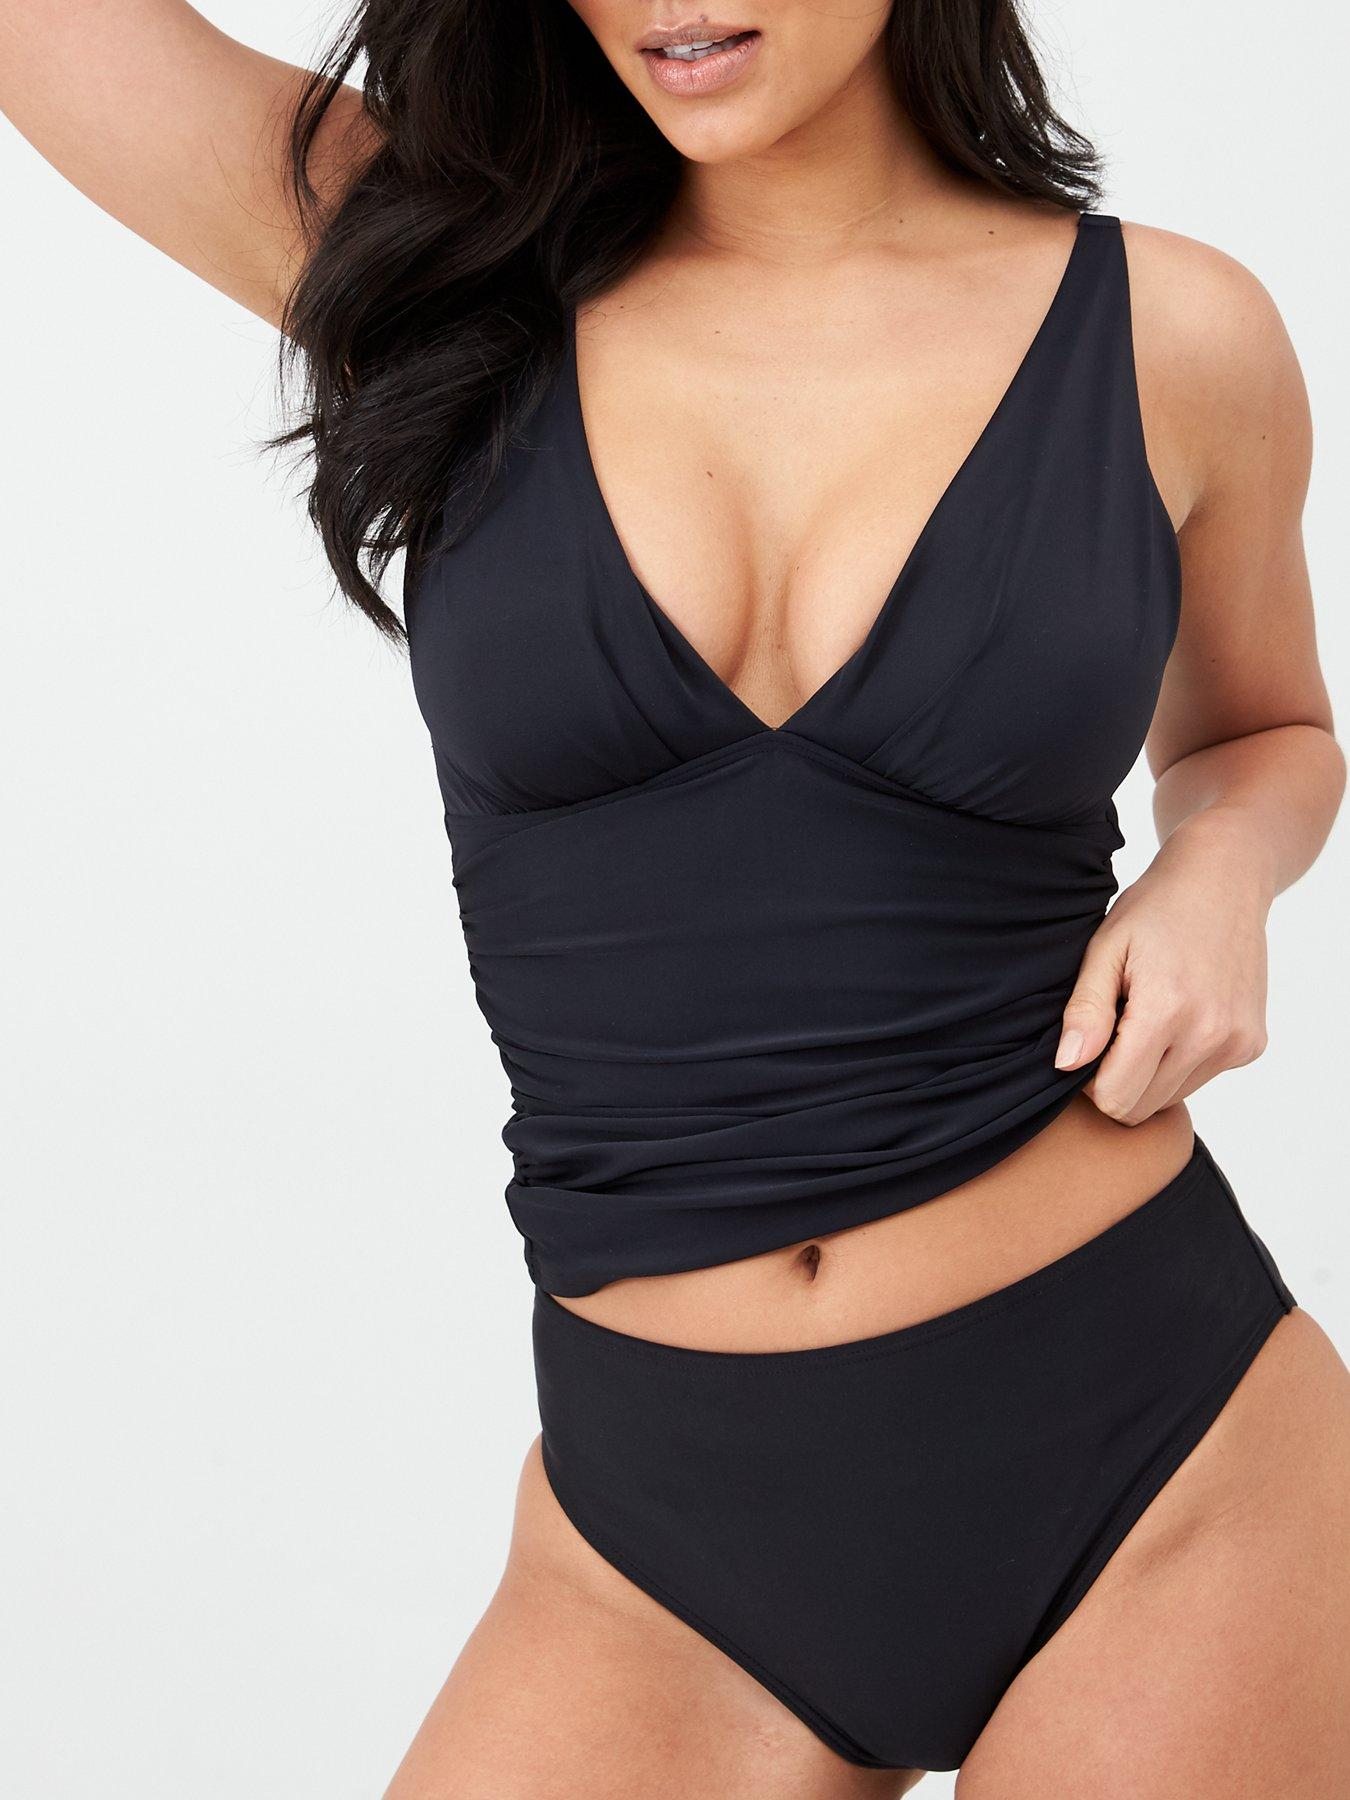 Brands Trendy Tankini Size 50-54 Black Patterned Tone NEW 377